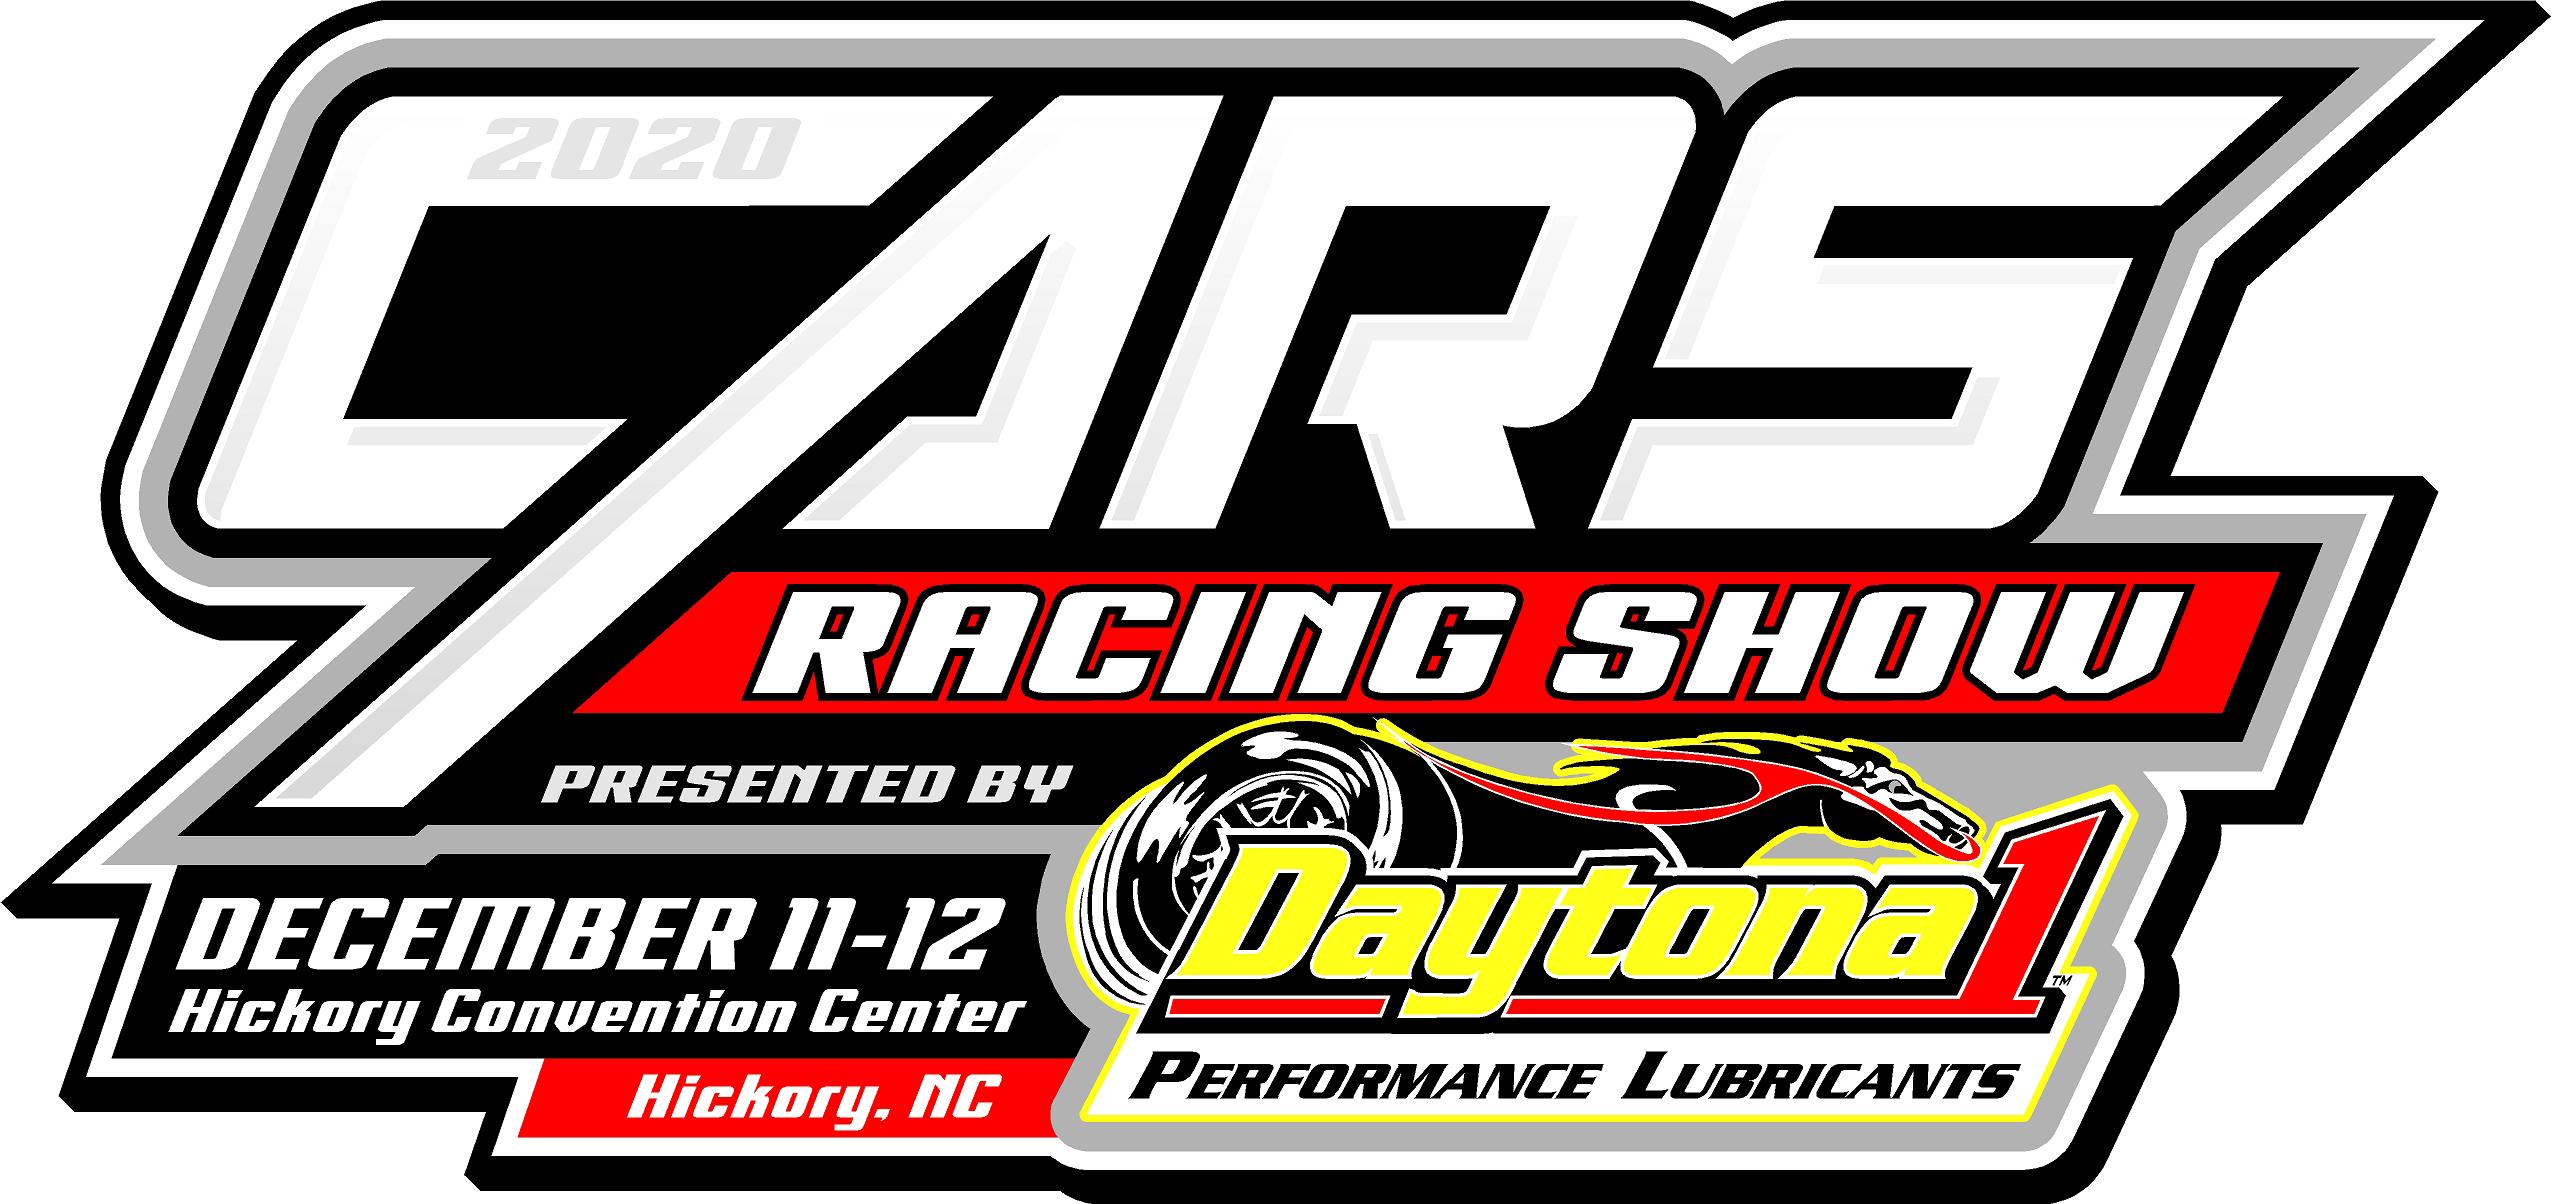 CARS Racing Show